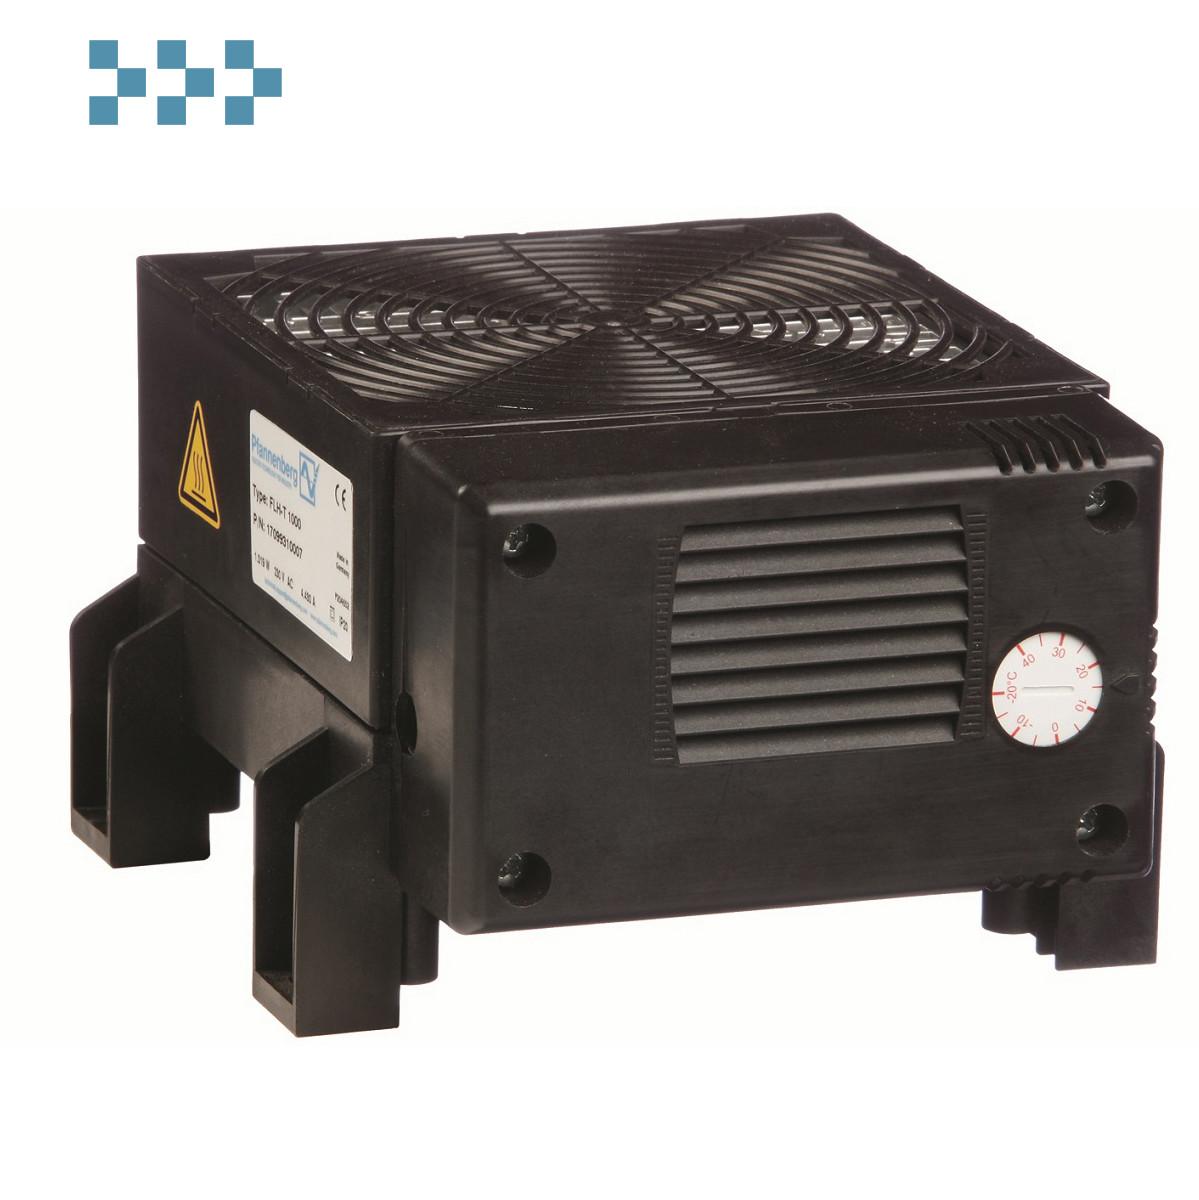 Компактный нагреватель ЦМО FLH-T 250 Heater 230V